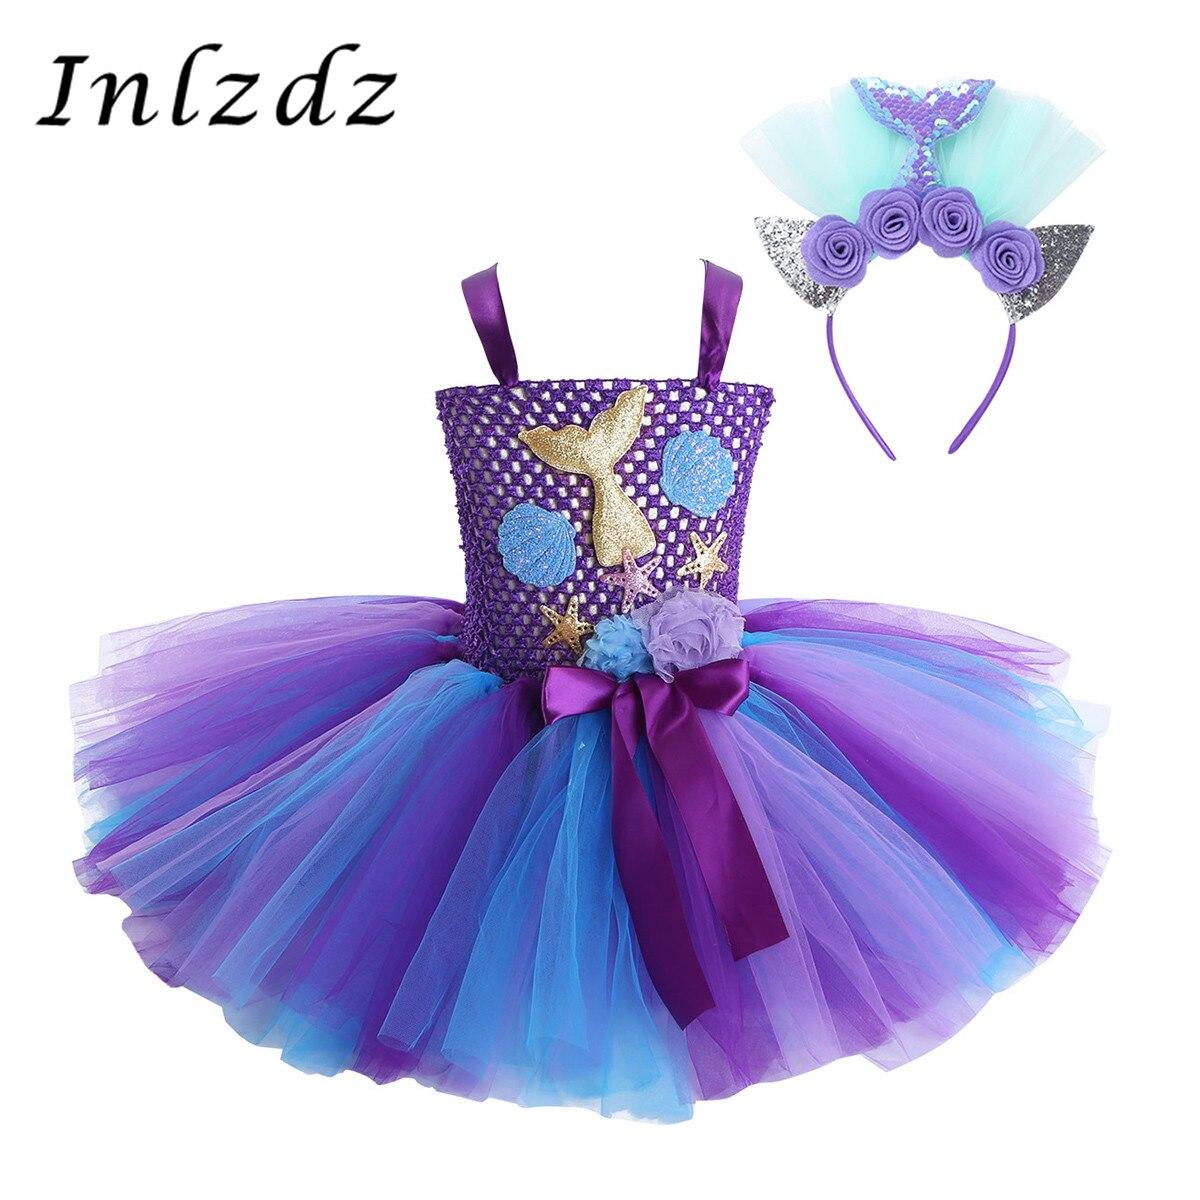 Traje de carnaval de sereia para meninas, cosplay, roupa, rabo de sereia, vestido tutu com arco de cabelo, para halloween, roupas de jogo